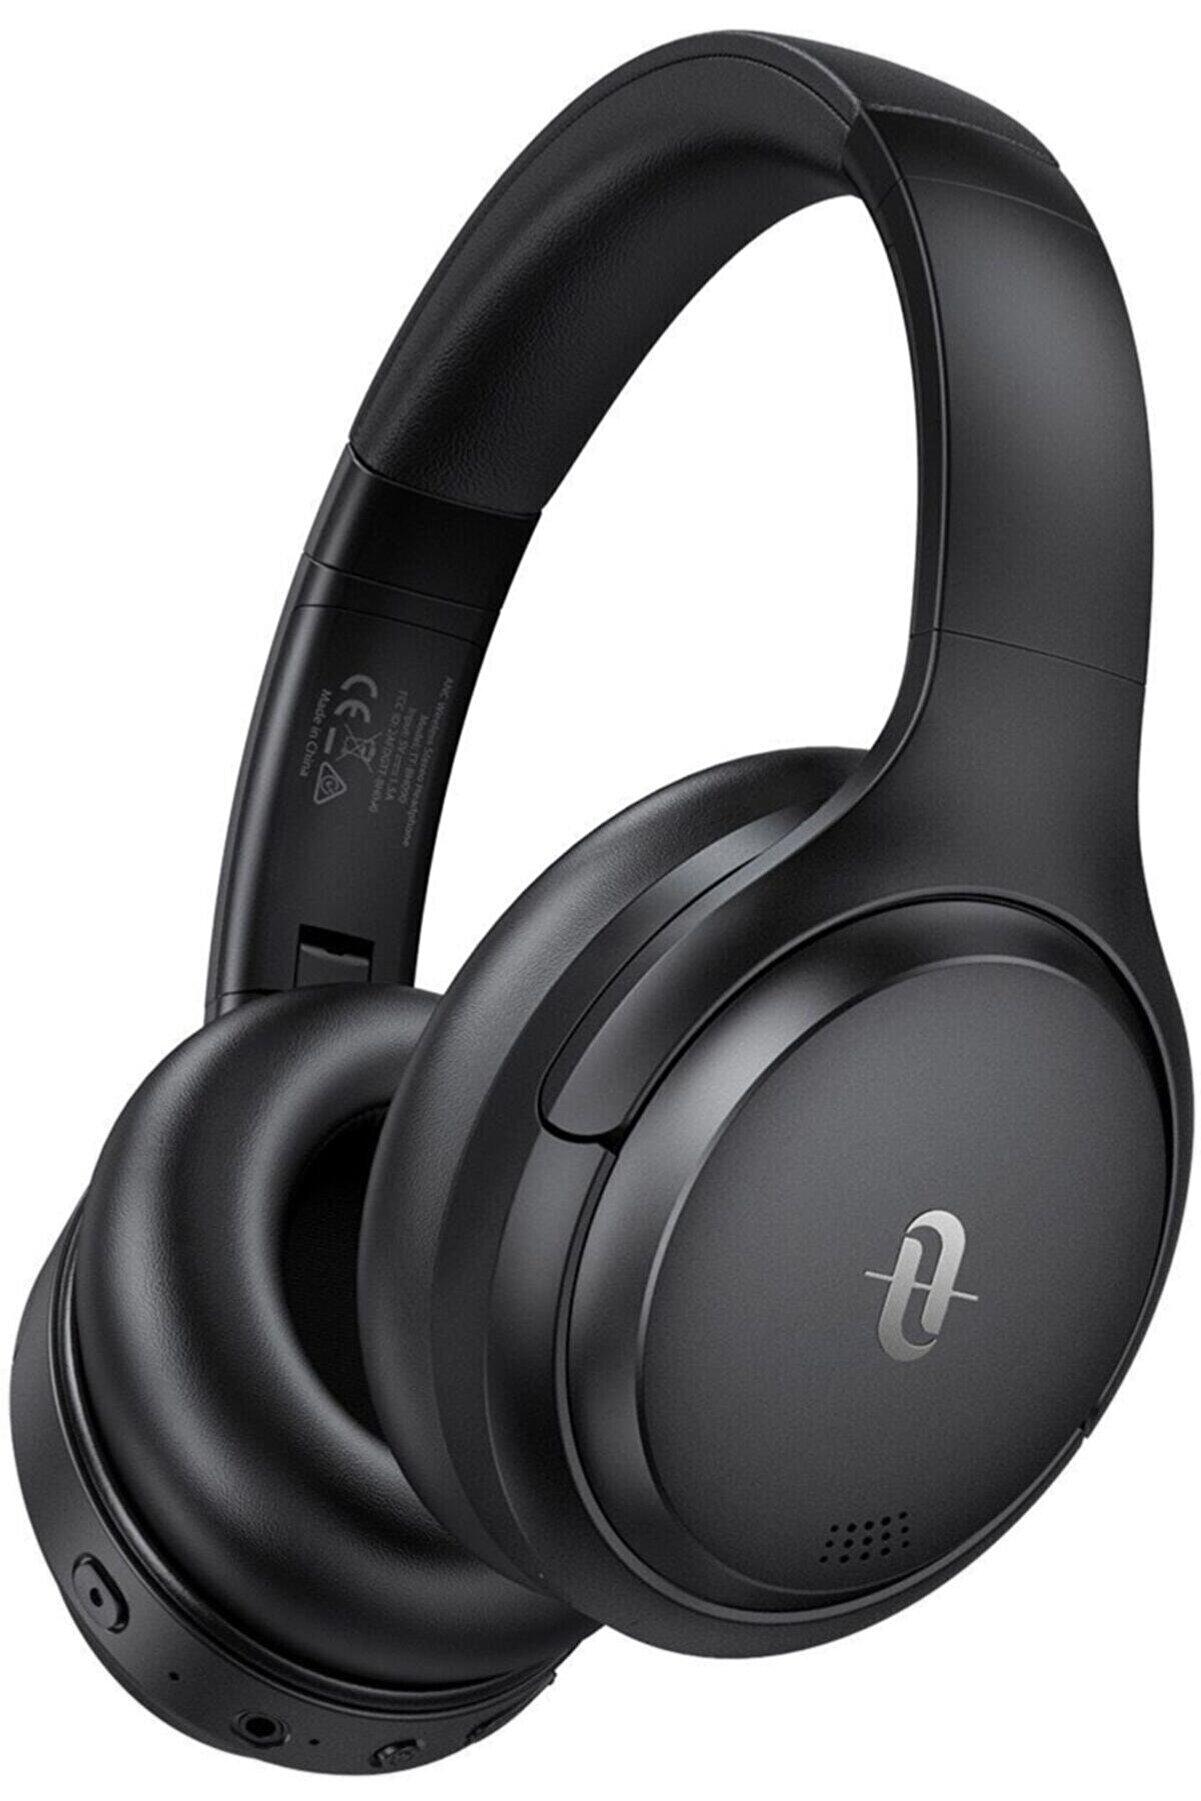 TaoTronics Soundsurge 90 Hibrit Aktif Gürültü Engelleyicili Anc Bluetooth Kulaklık Tt-bh090